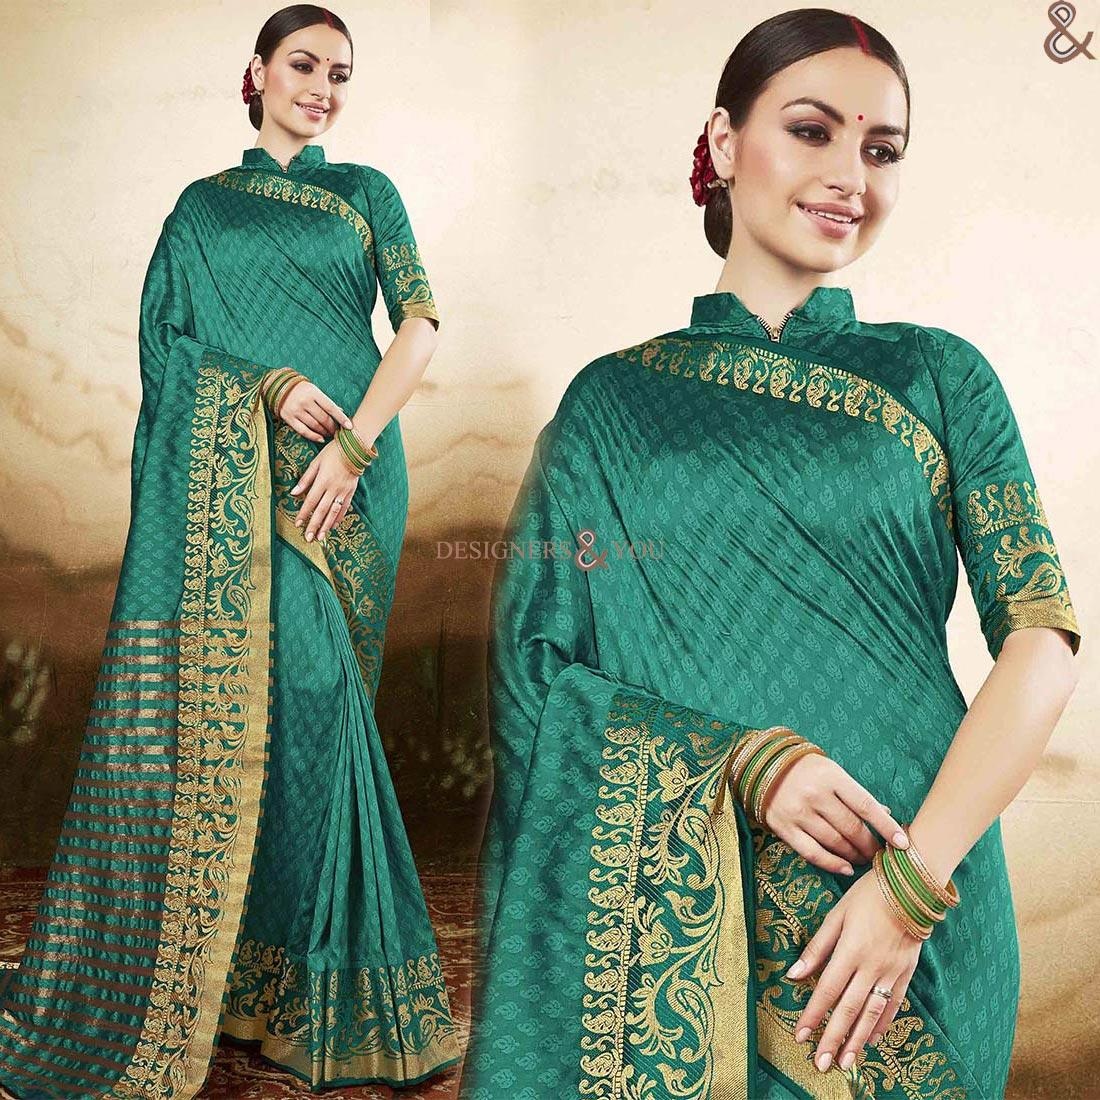 ee98e692e3552 Graceful Green Raw Silk Printed Simple Saree Blouse Design - Mogul